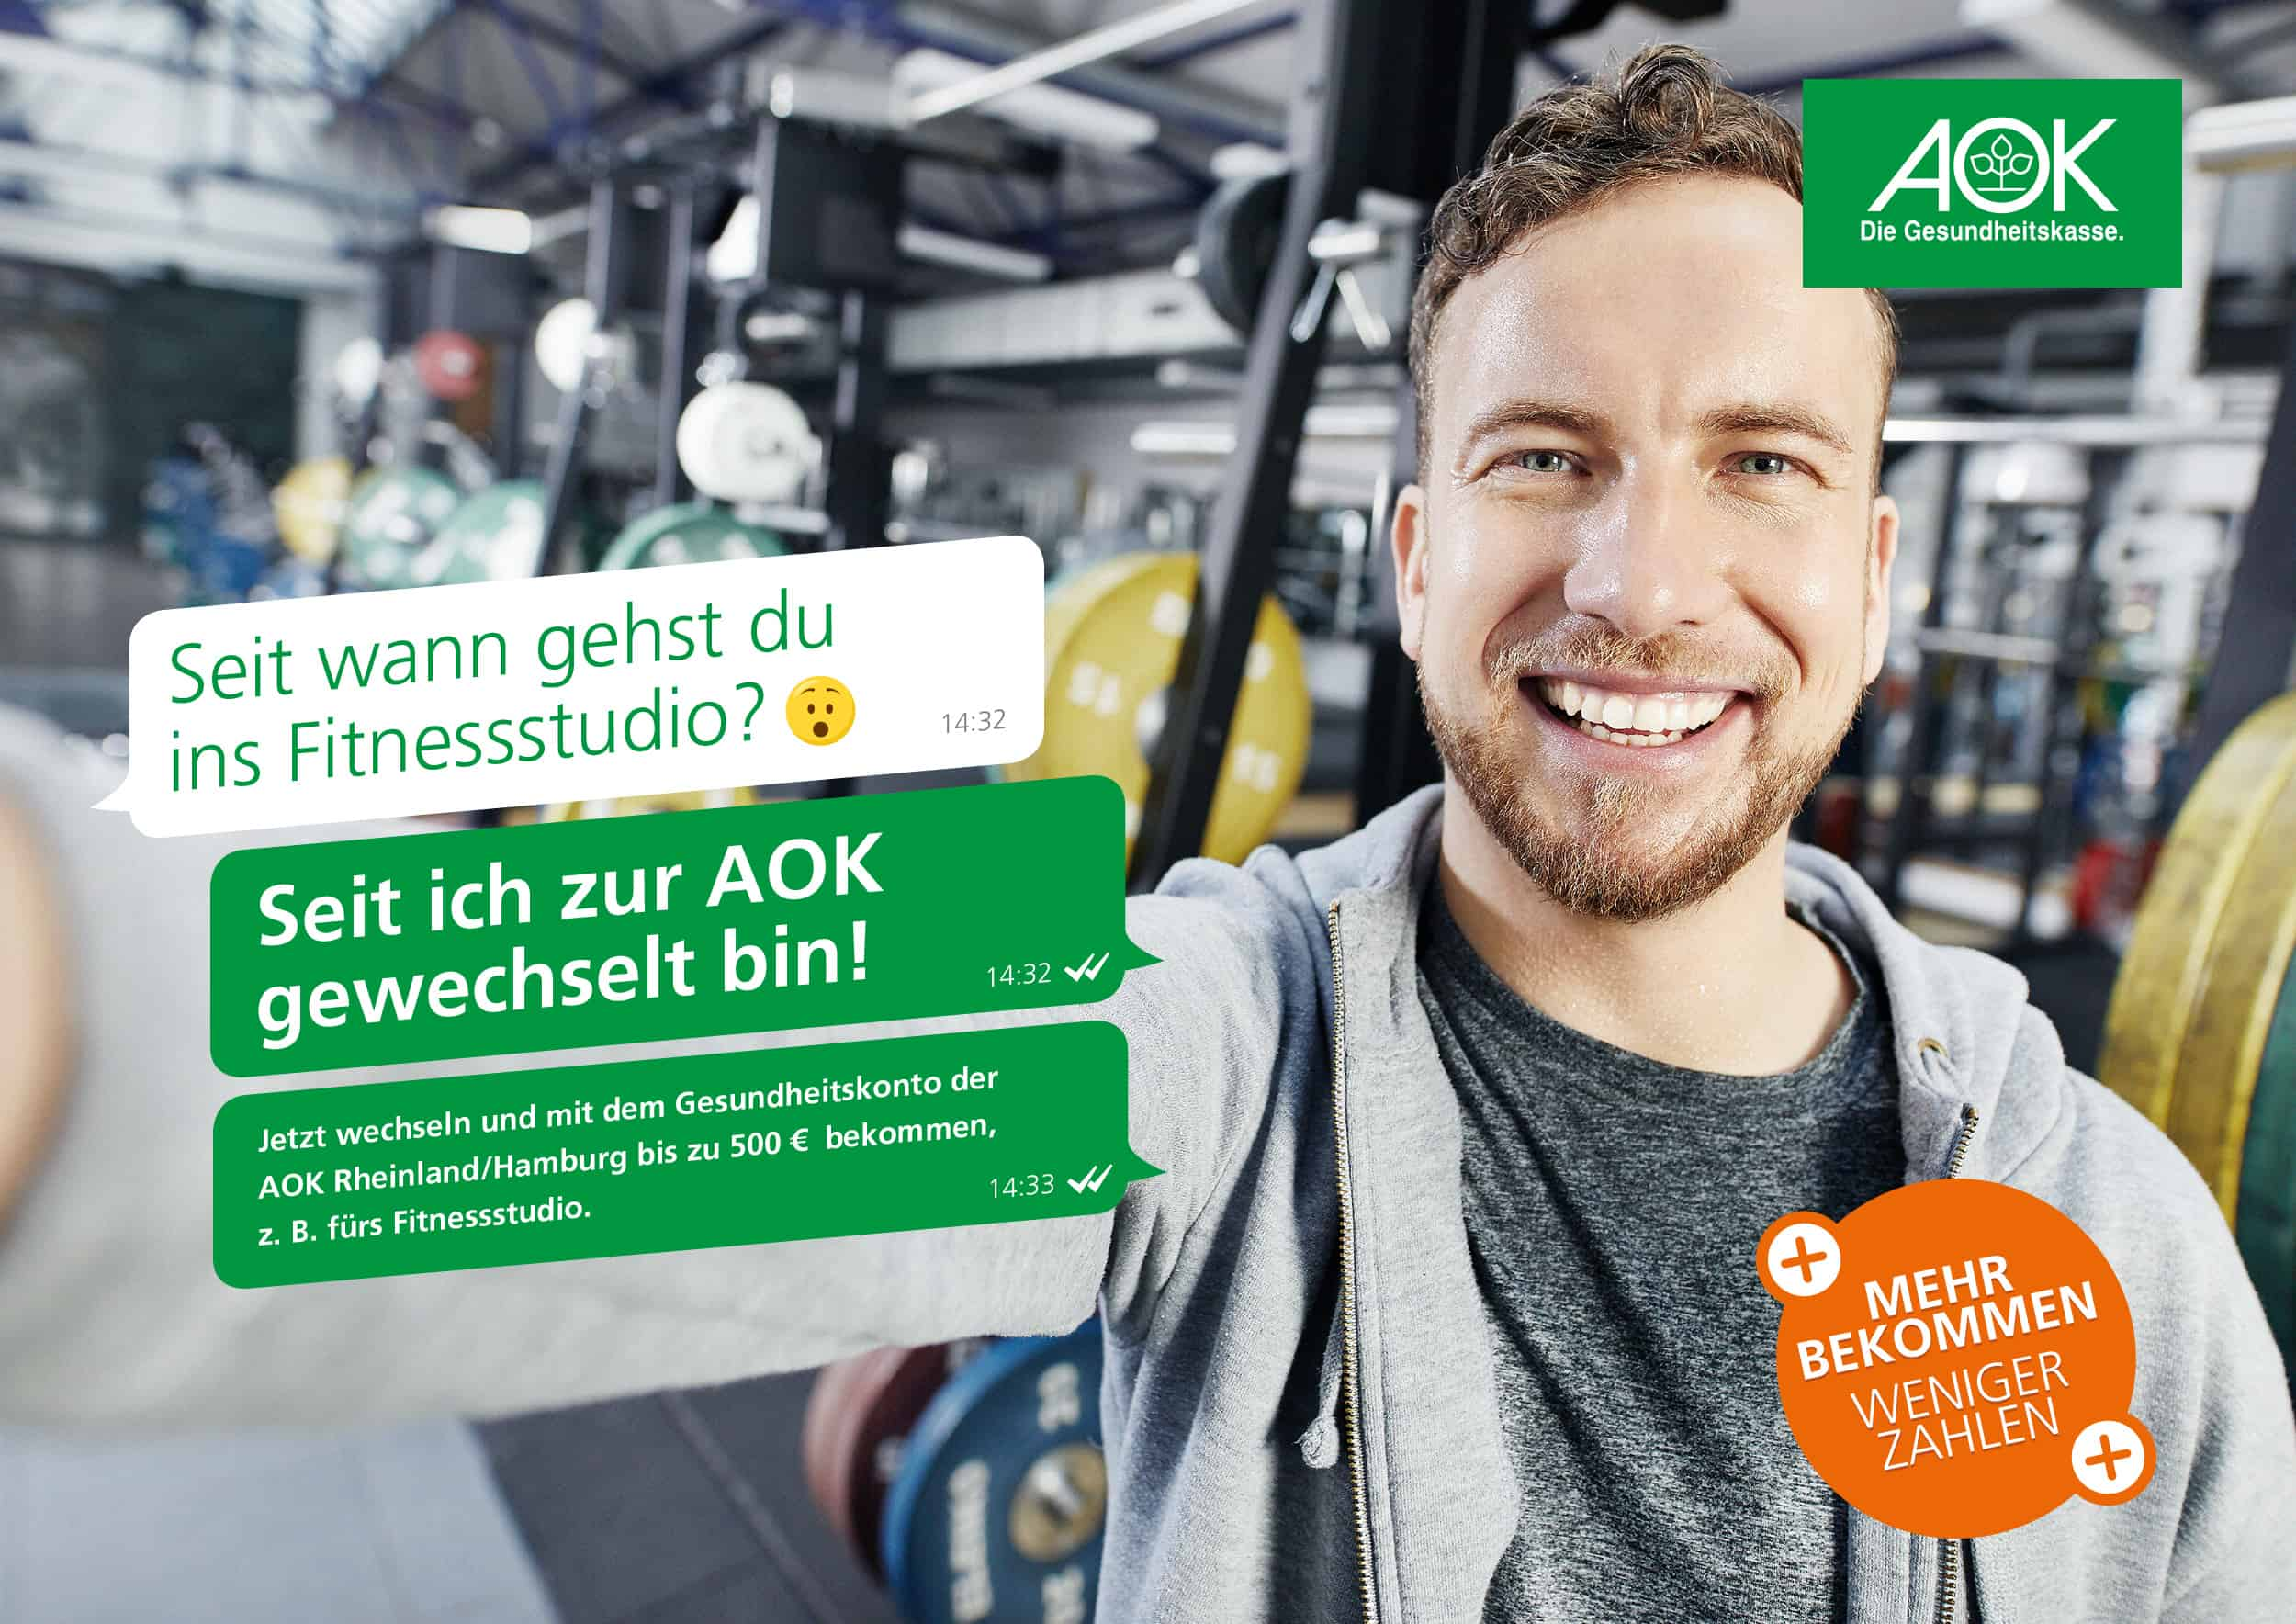 studio-ignatov-aok-jahreswechsel-fitnessstudio-quer